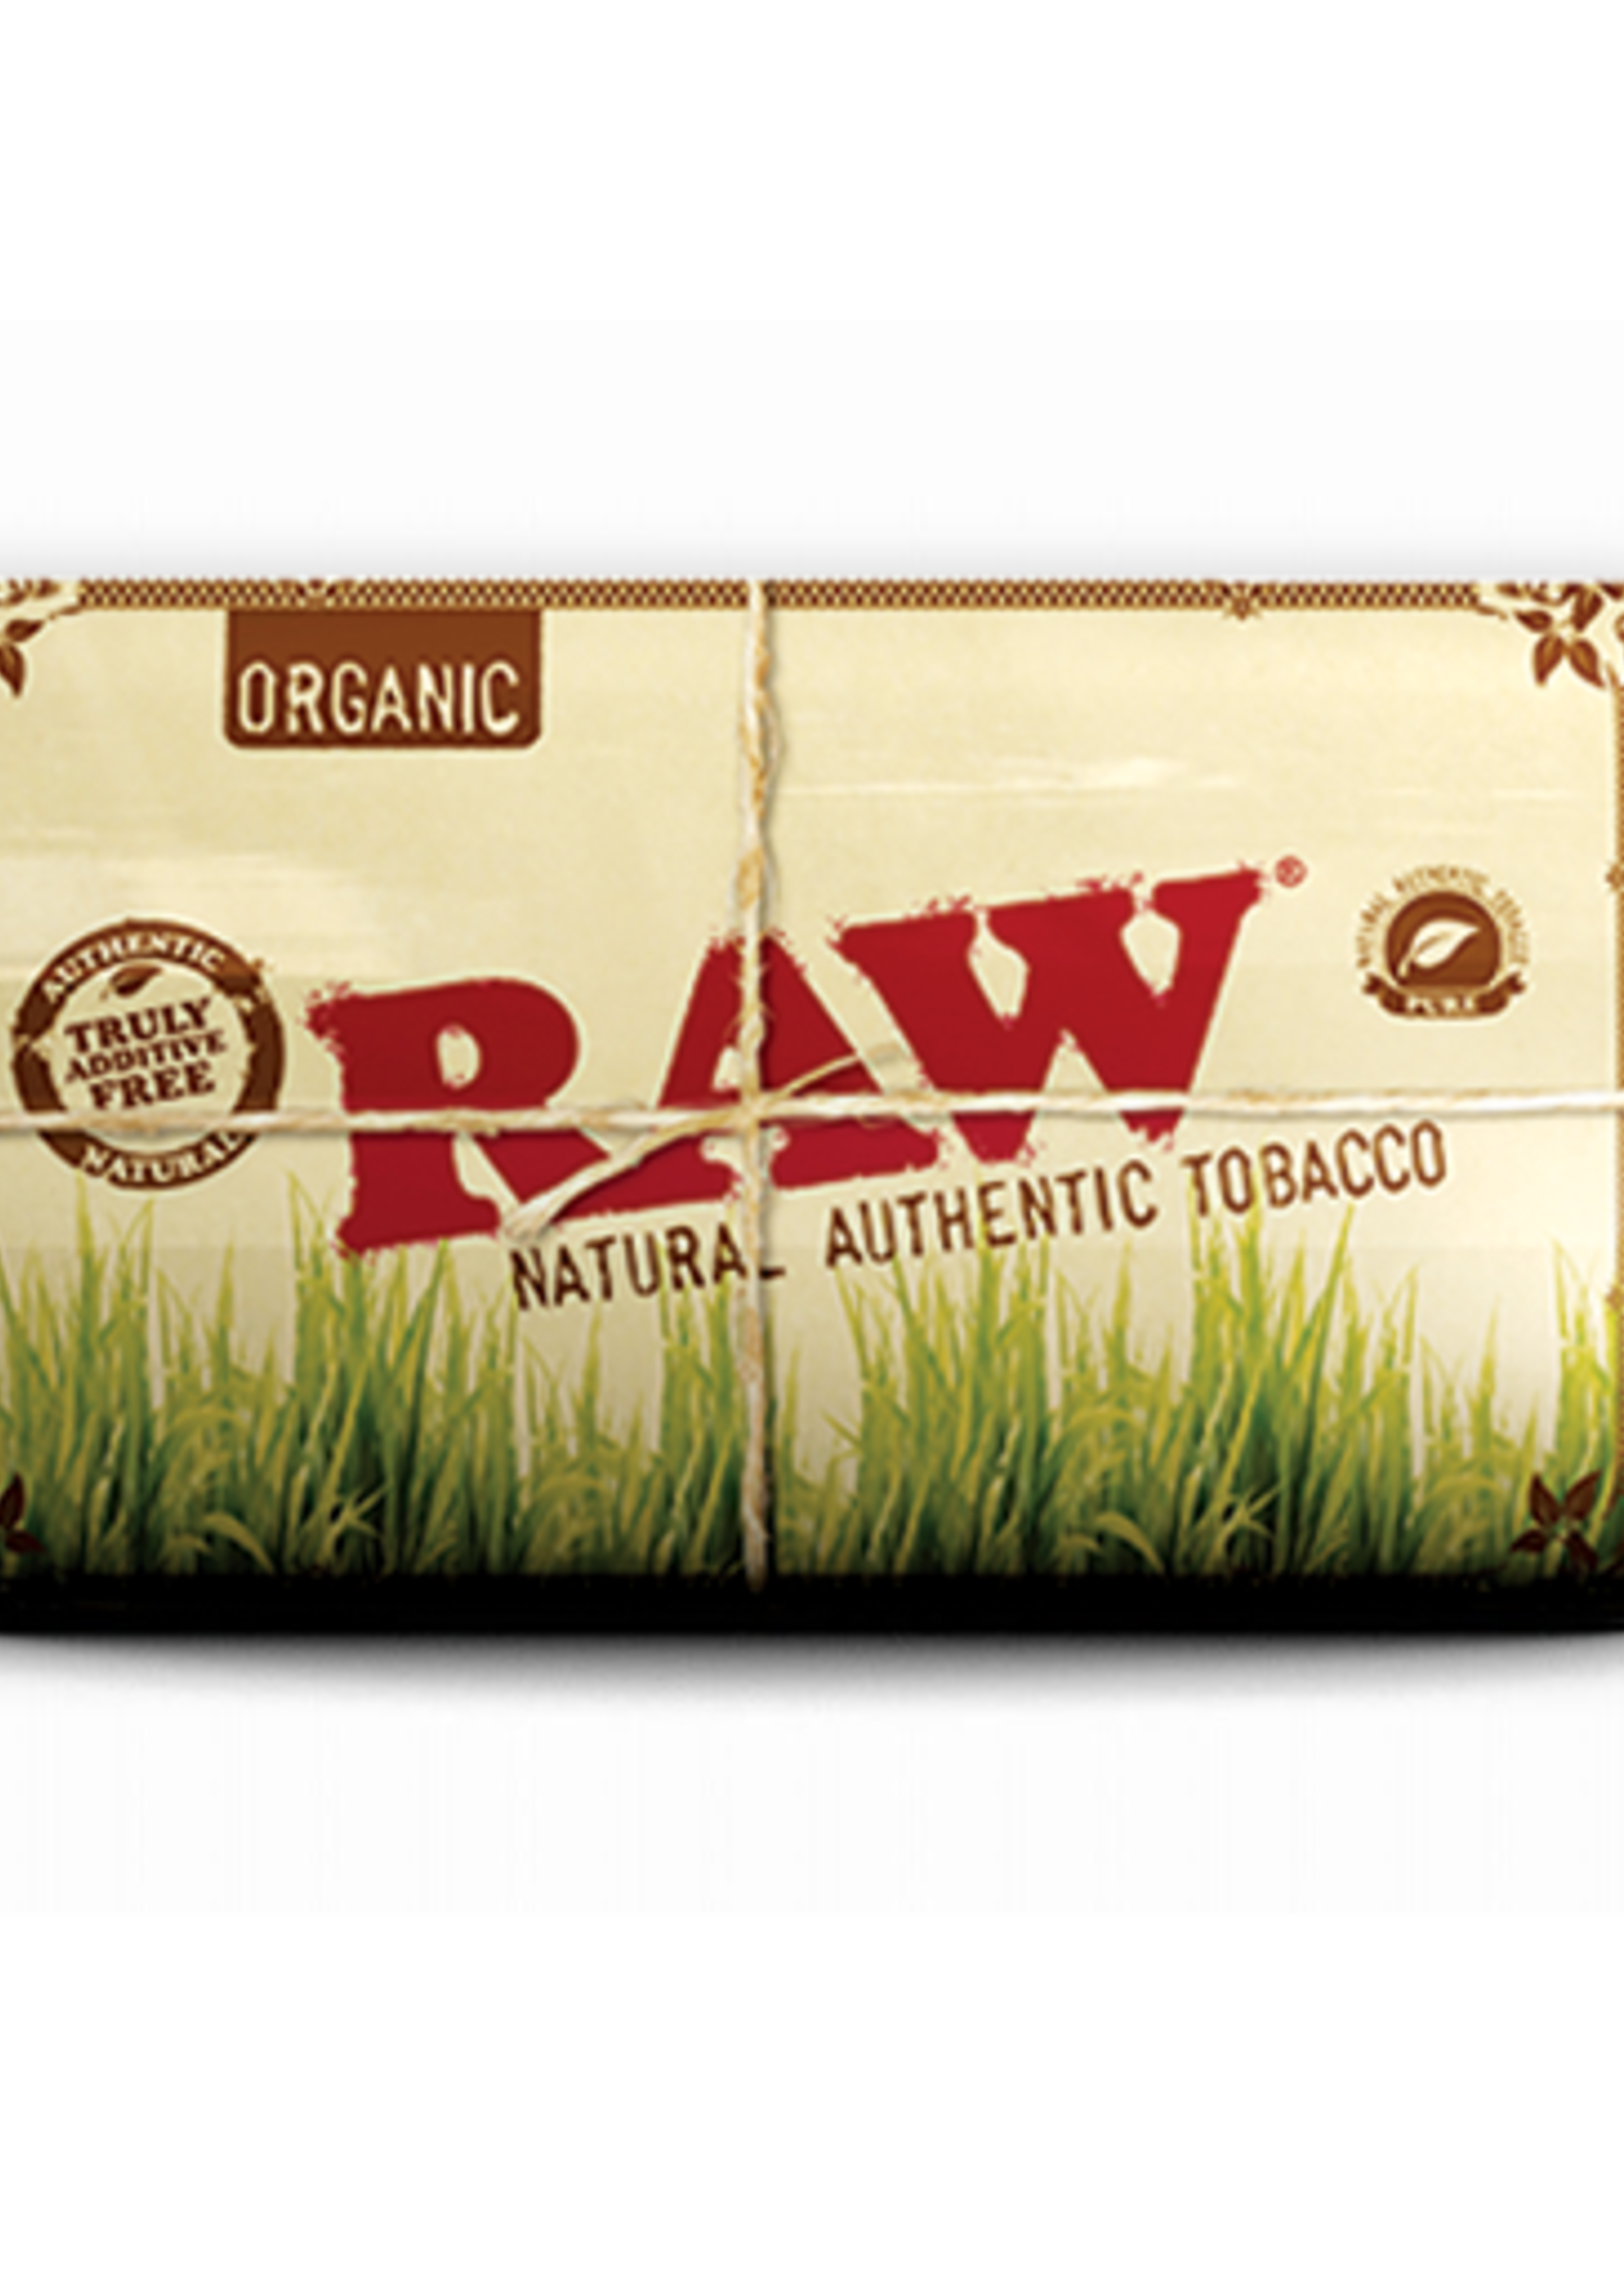 RAW - Organic rolling tobacco